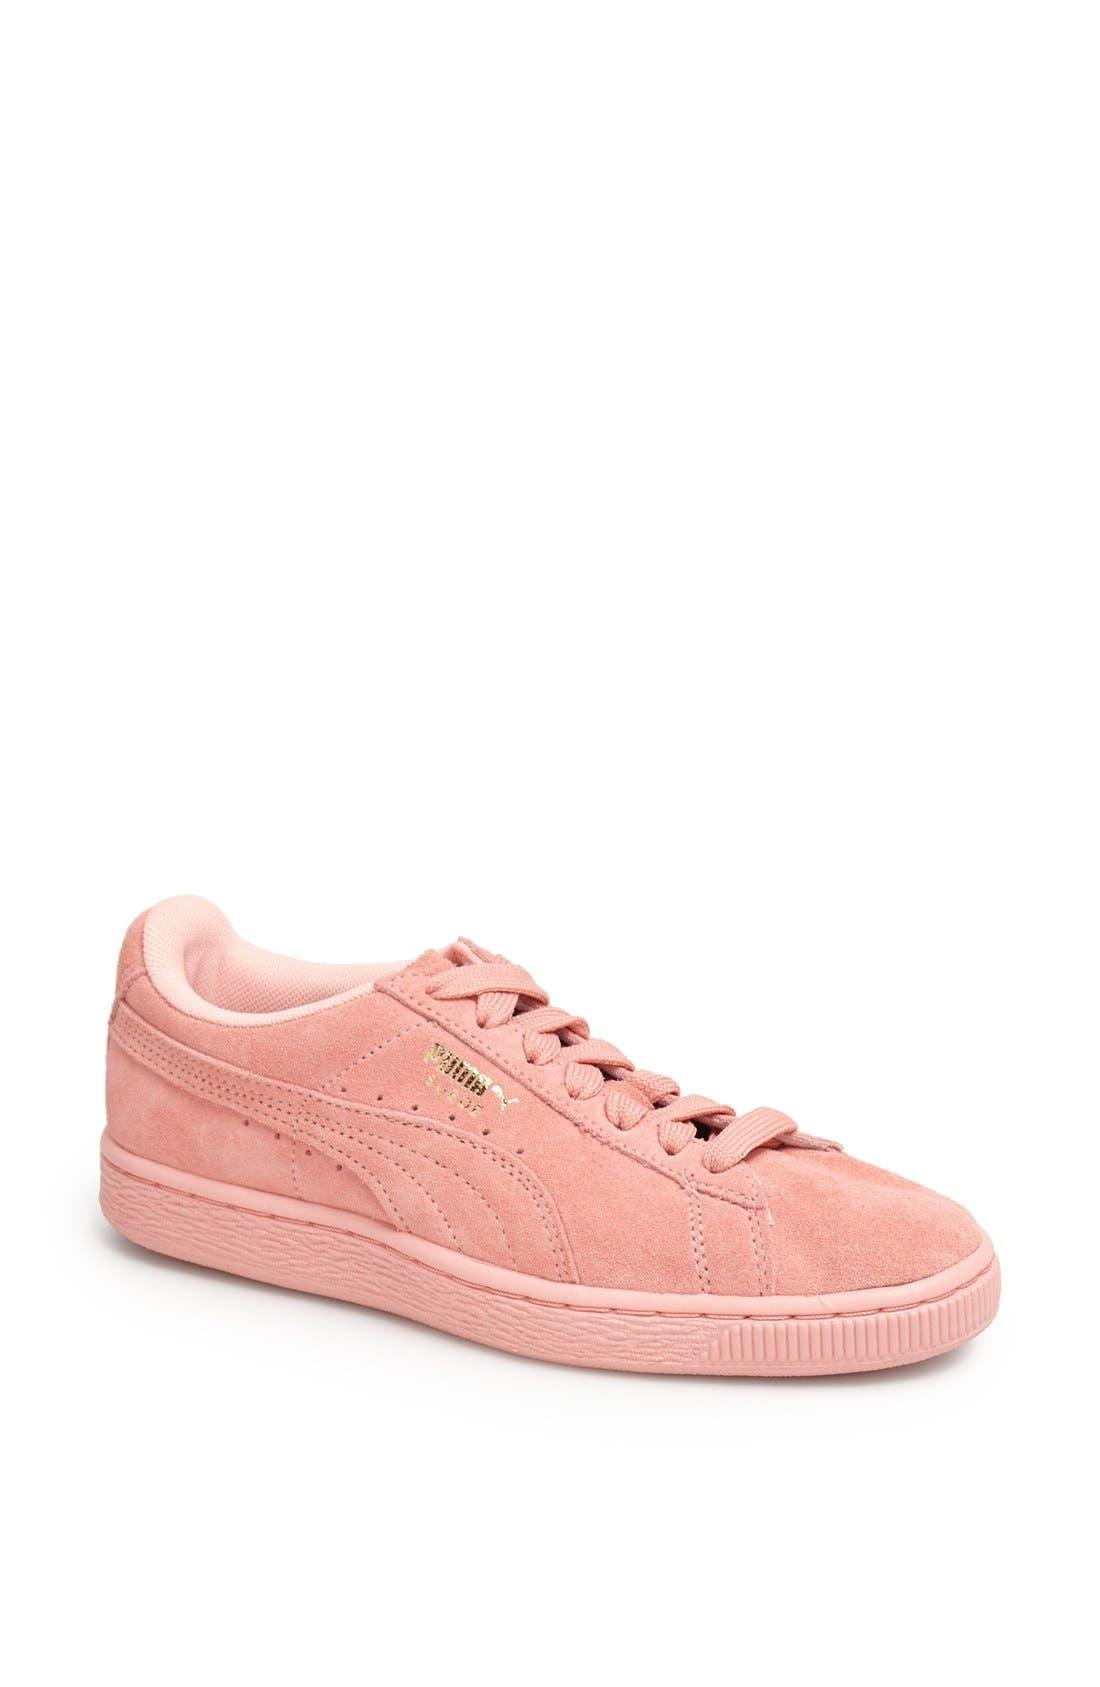 Alternate Image 1 Selected - PUMA Suede Sneaker (Women)